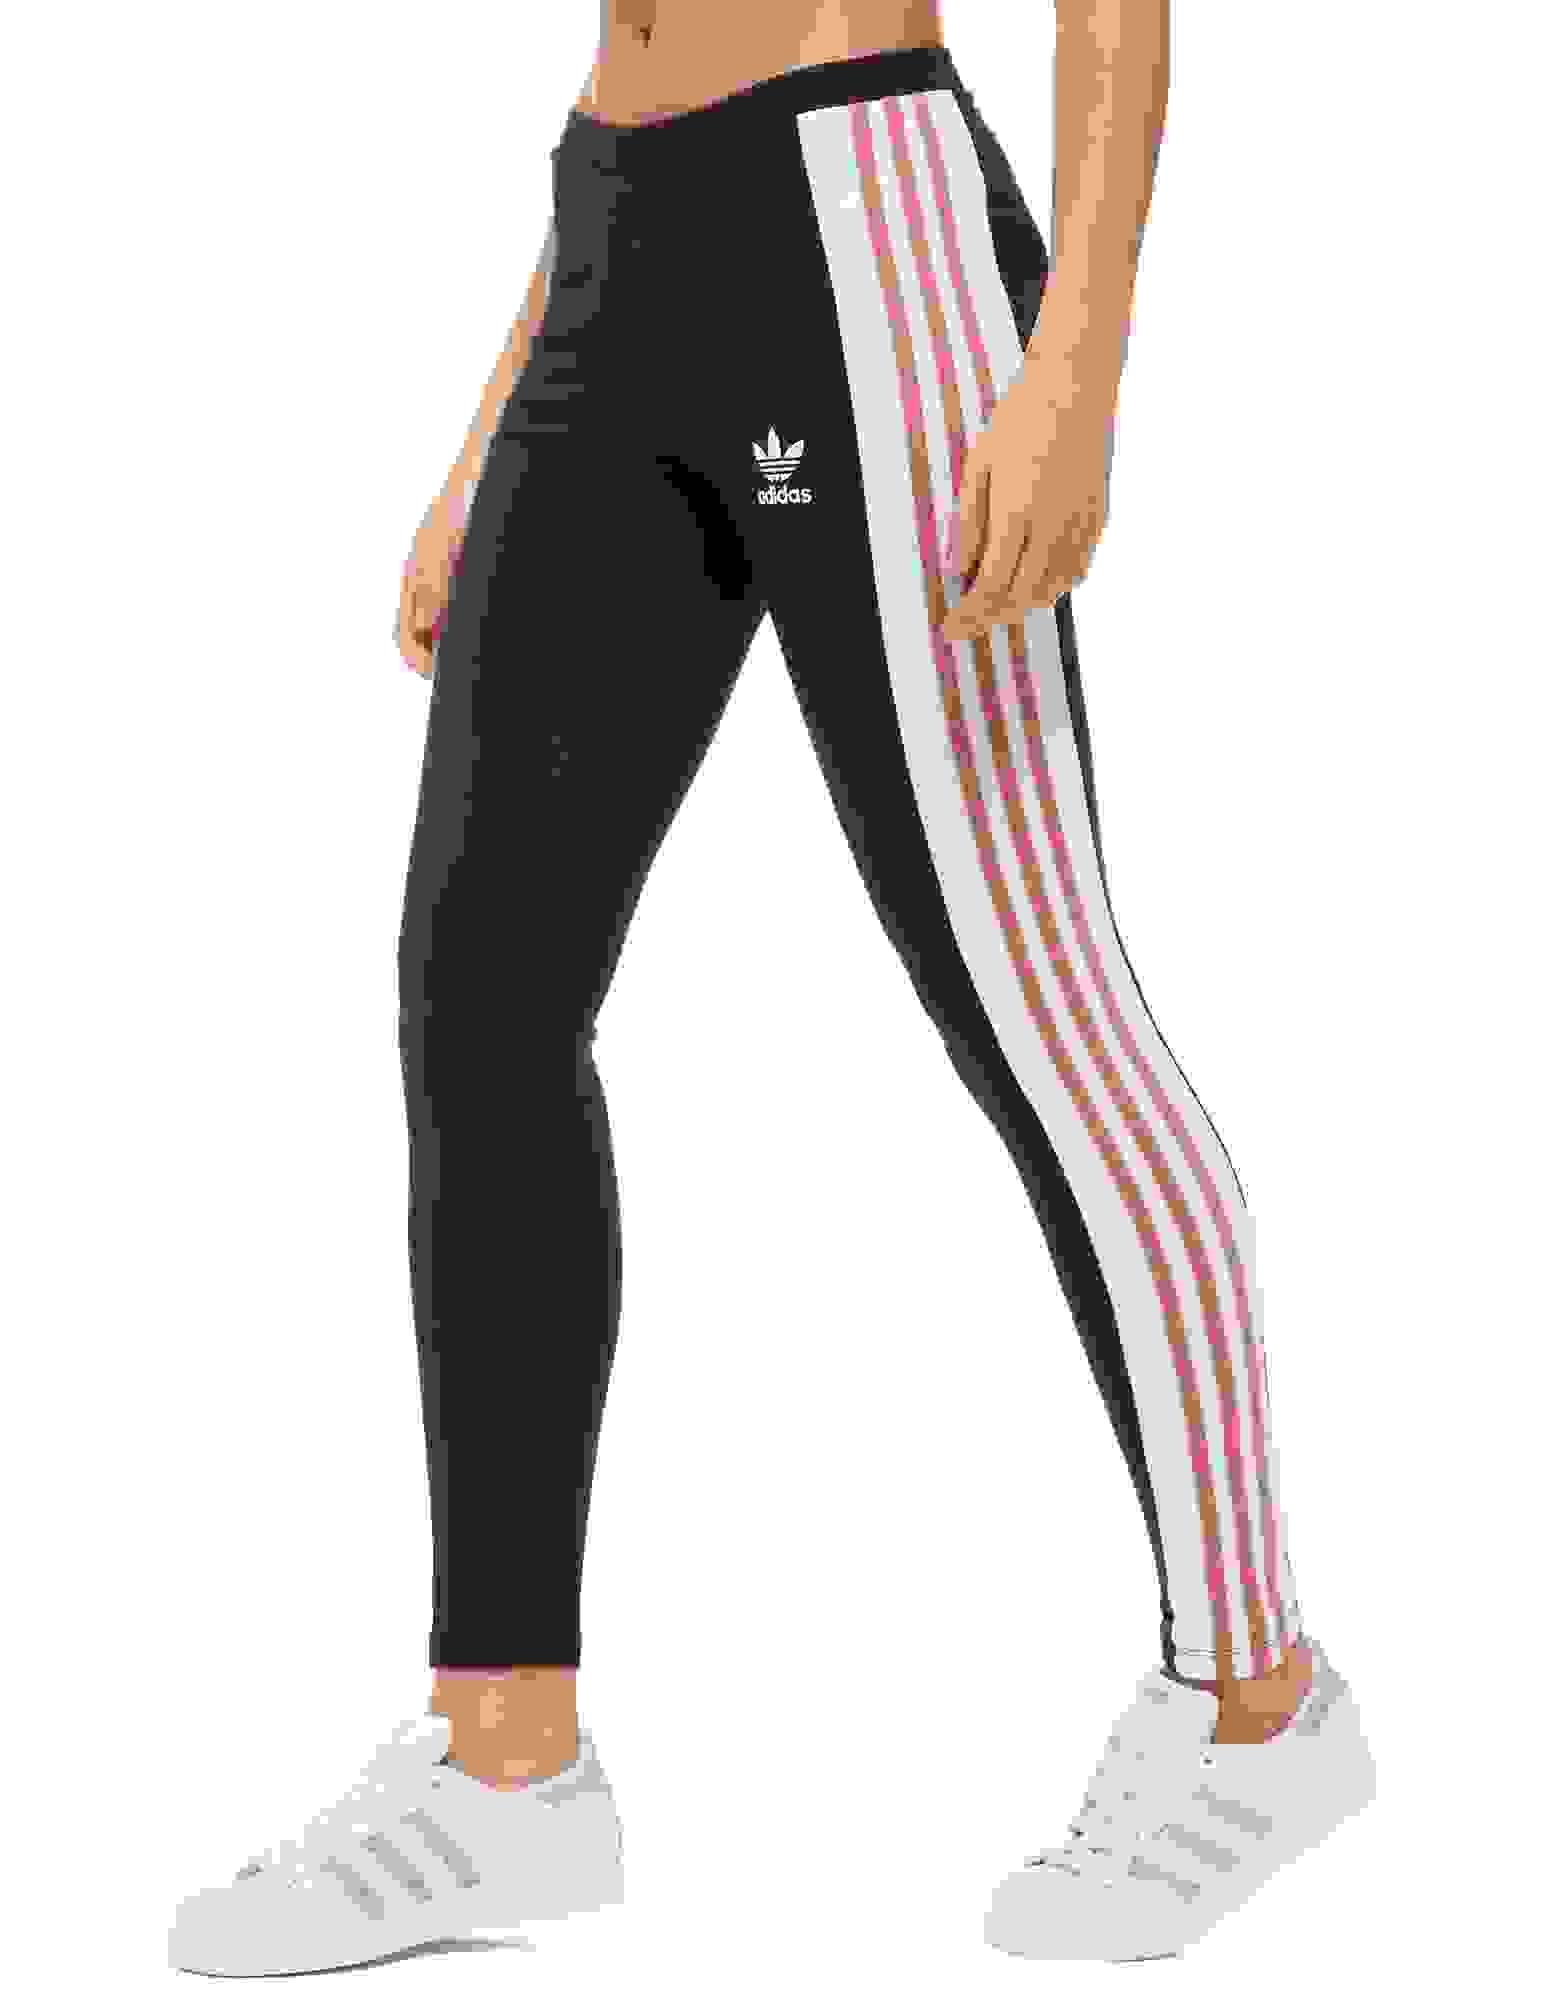 Adidas 3 stripes stripes stripes crew leggings | Défi J'arrête, j'y gagne! e3fbe7